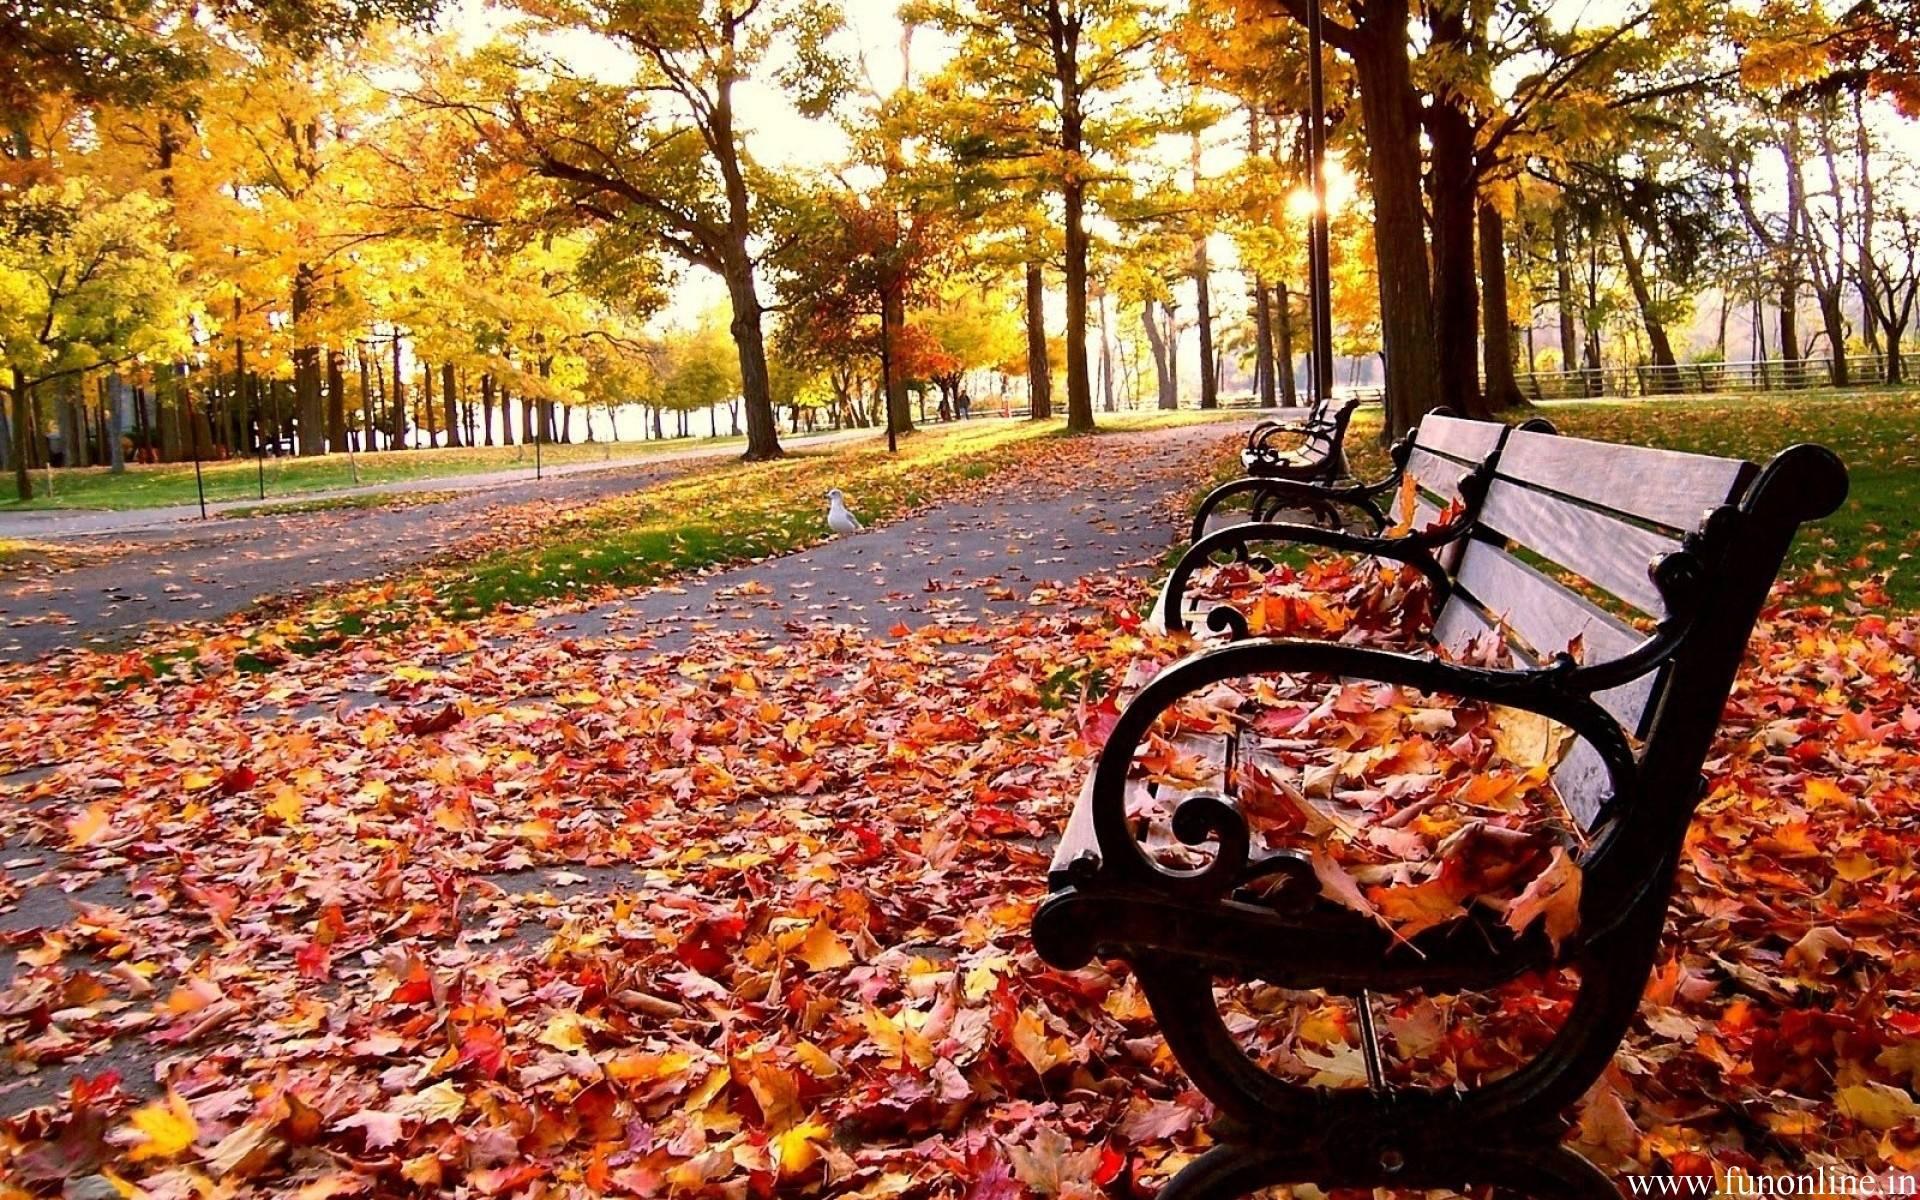 Fall Season Wallpapers - Full HD wallpaper search